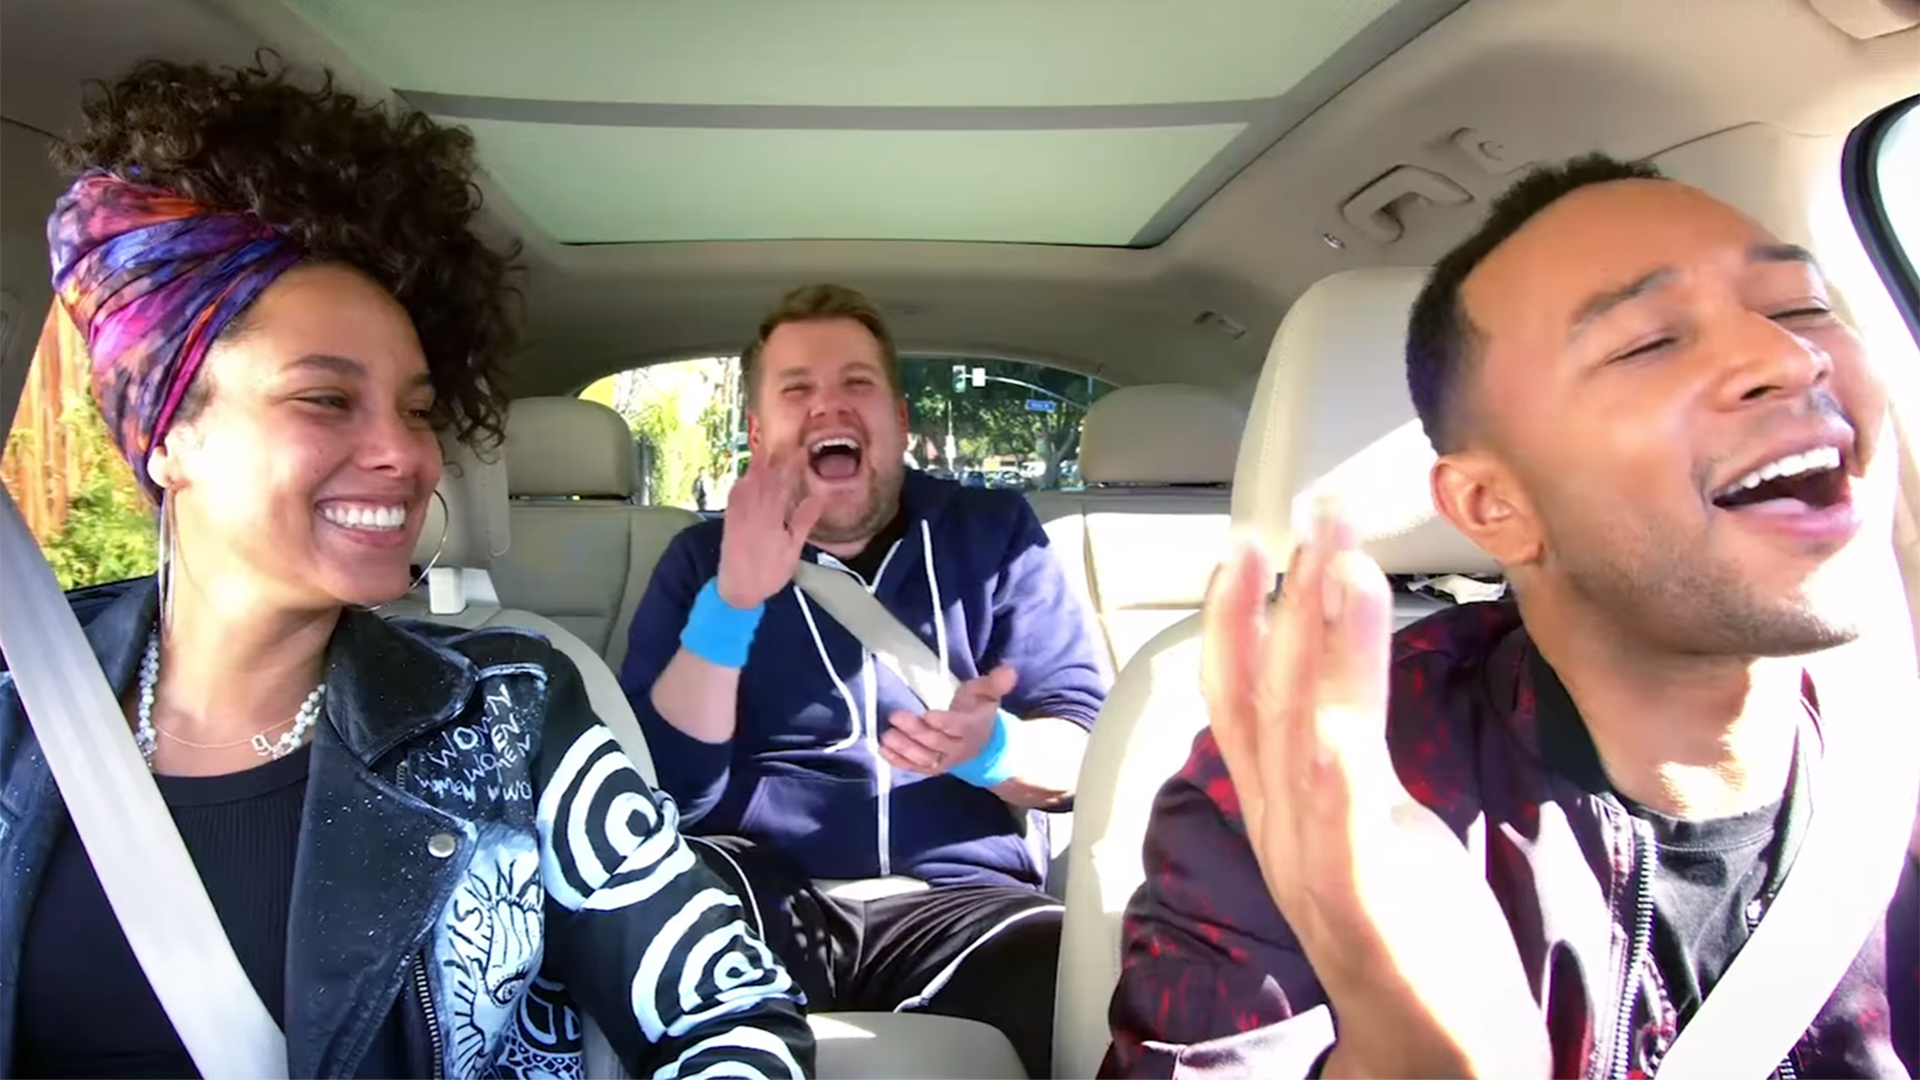 Carpool Karaoke: James Corden with Alicia Keys and John Legend.